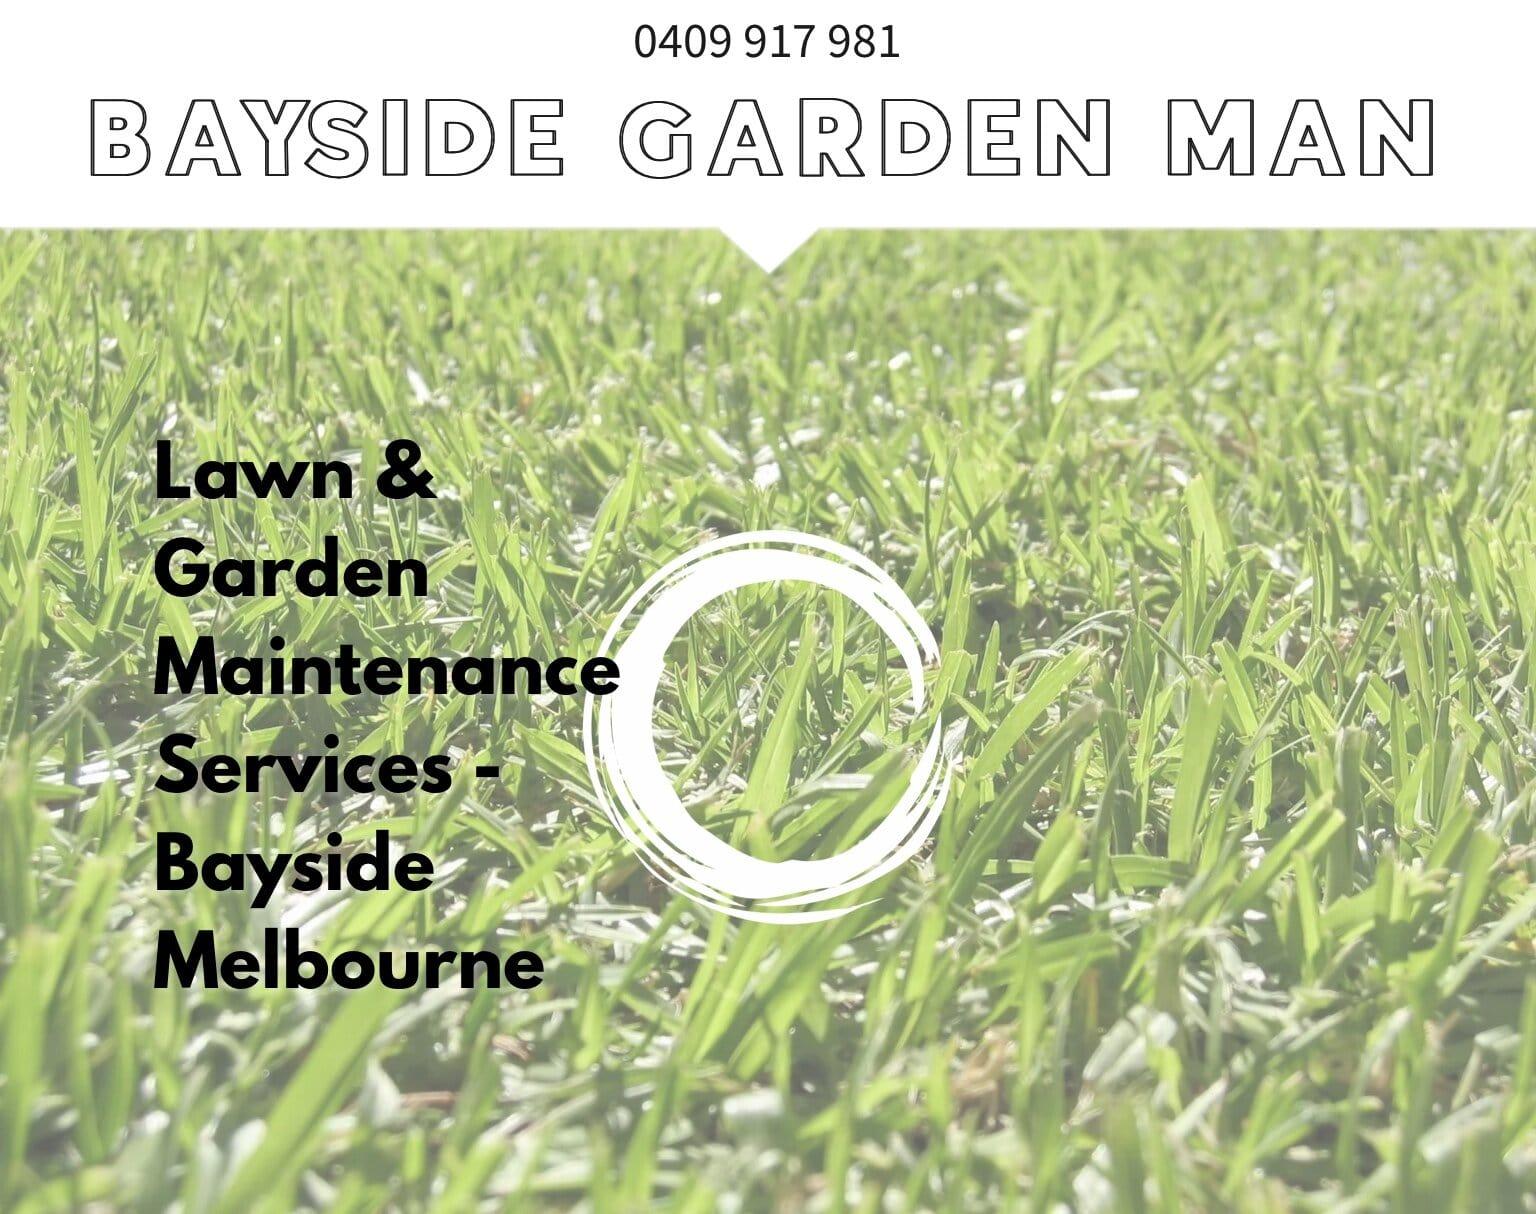 Bayside Garden Man